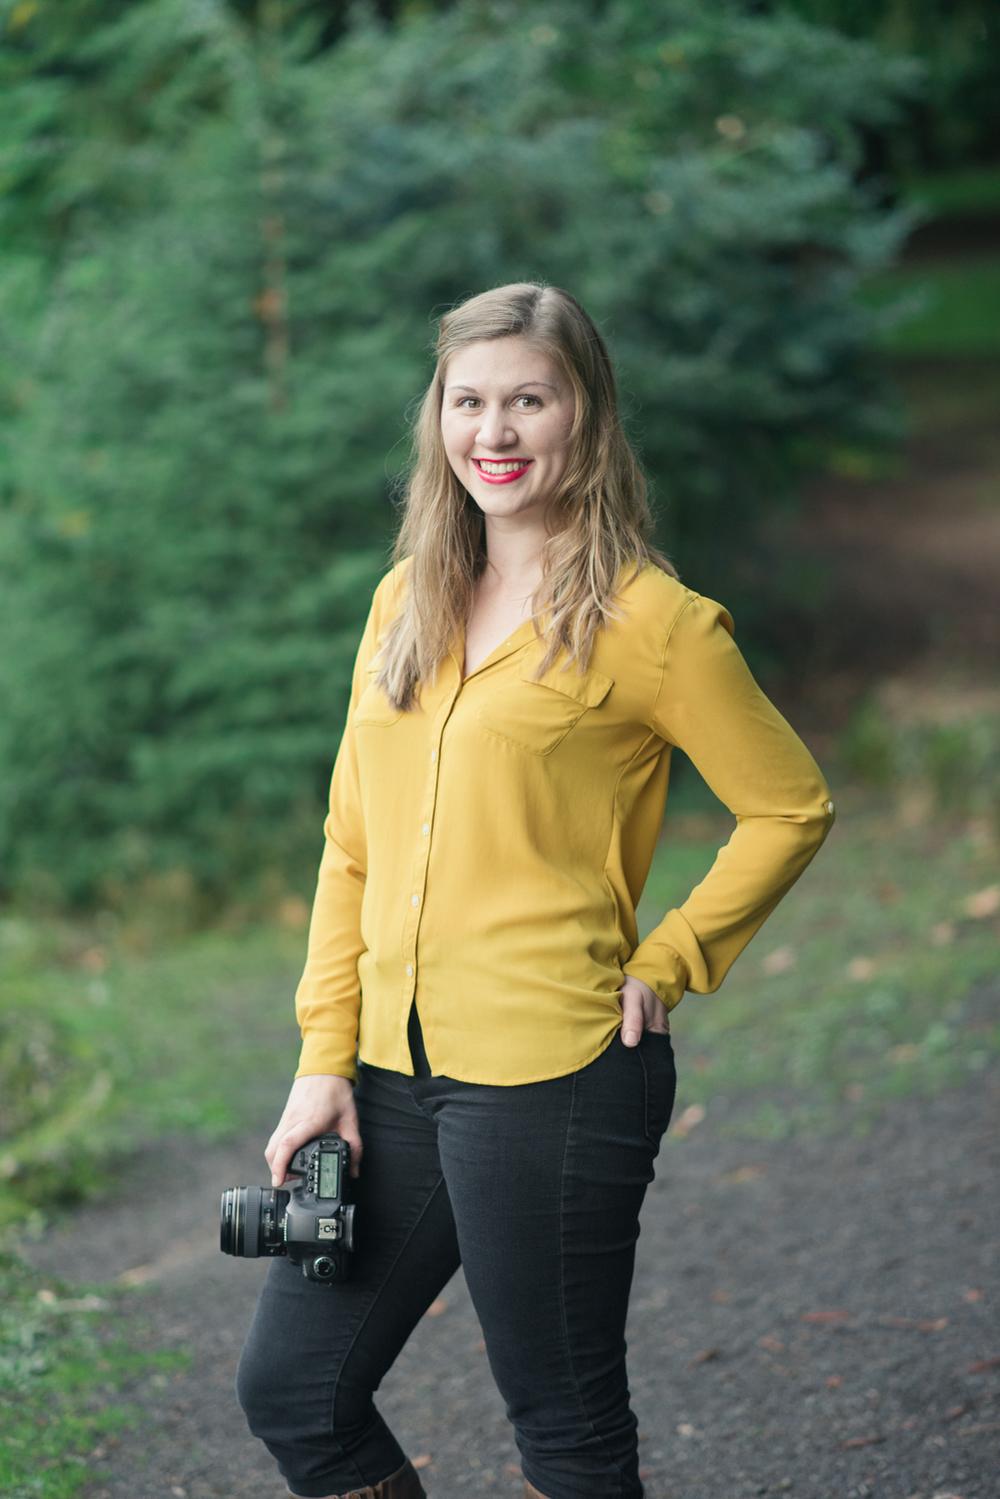 portland-senior-portrait-photographer-laurelhurst-park-photo-shelley-marie-photography-2